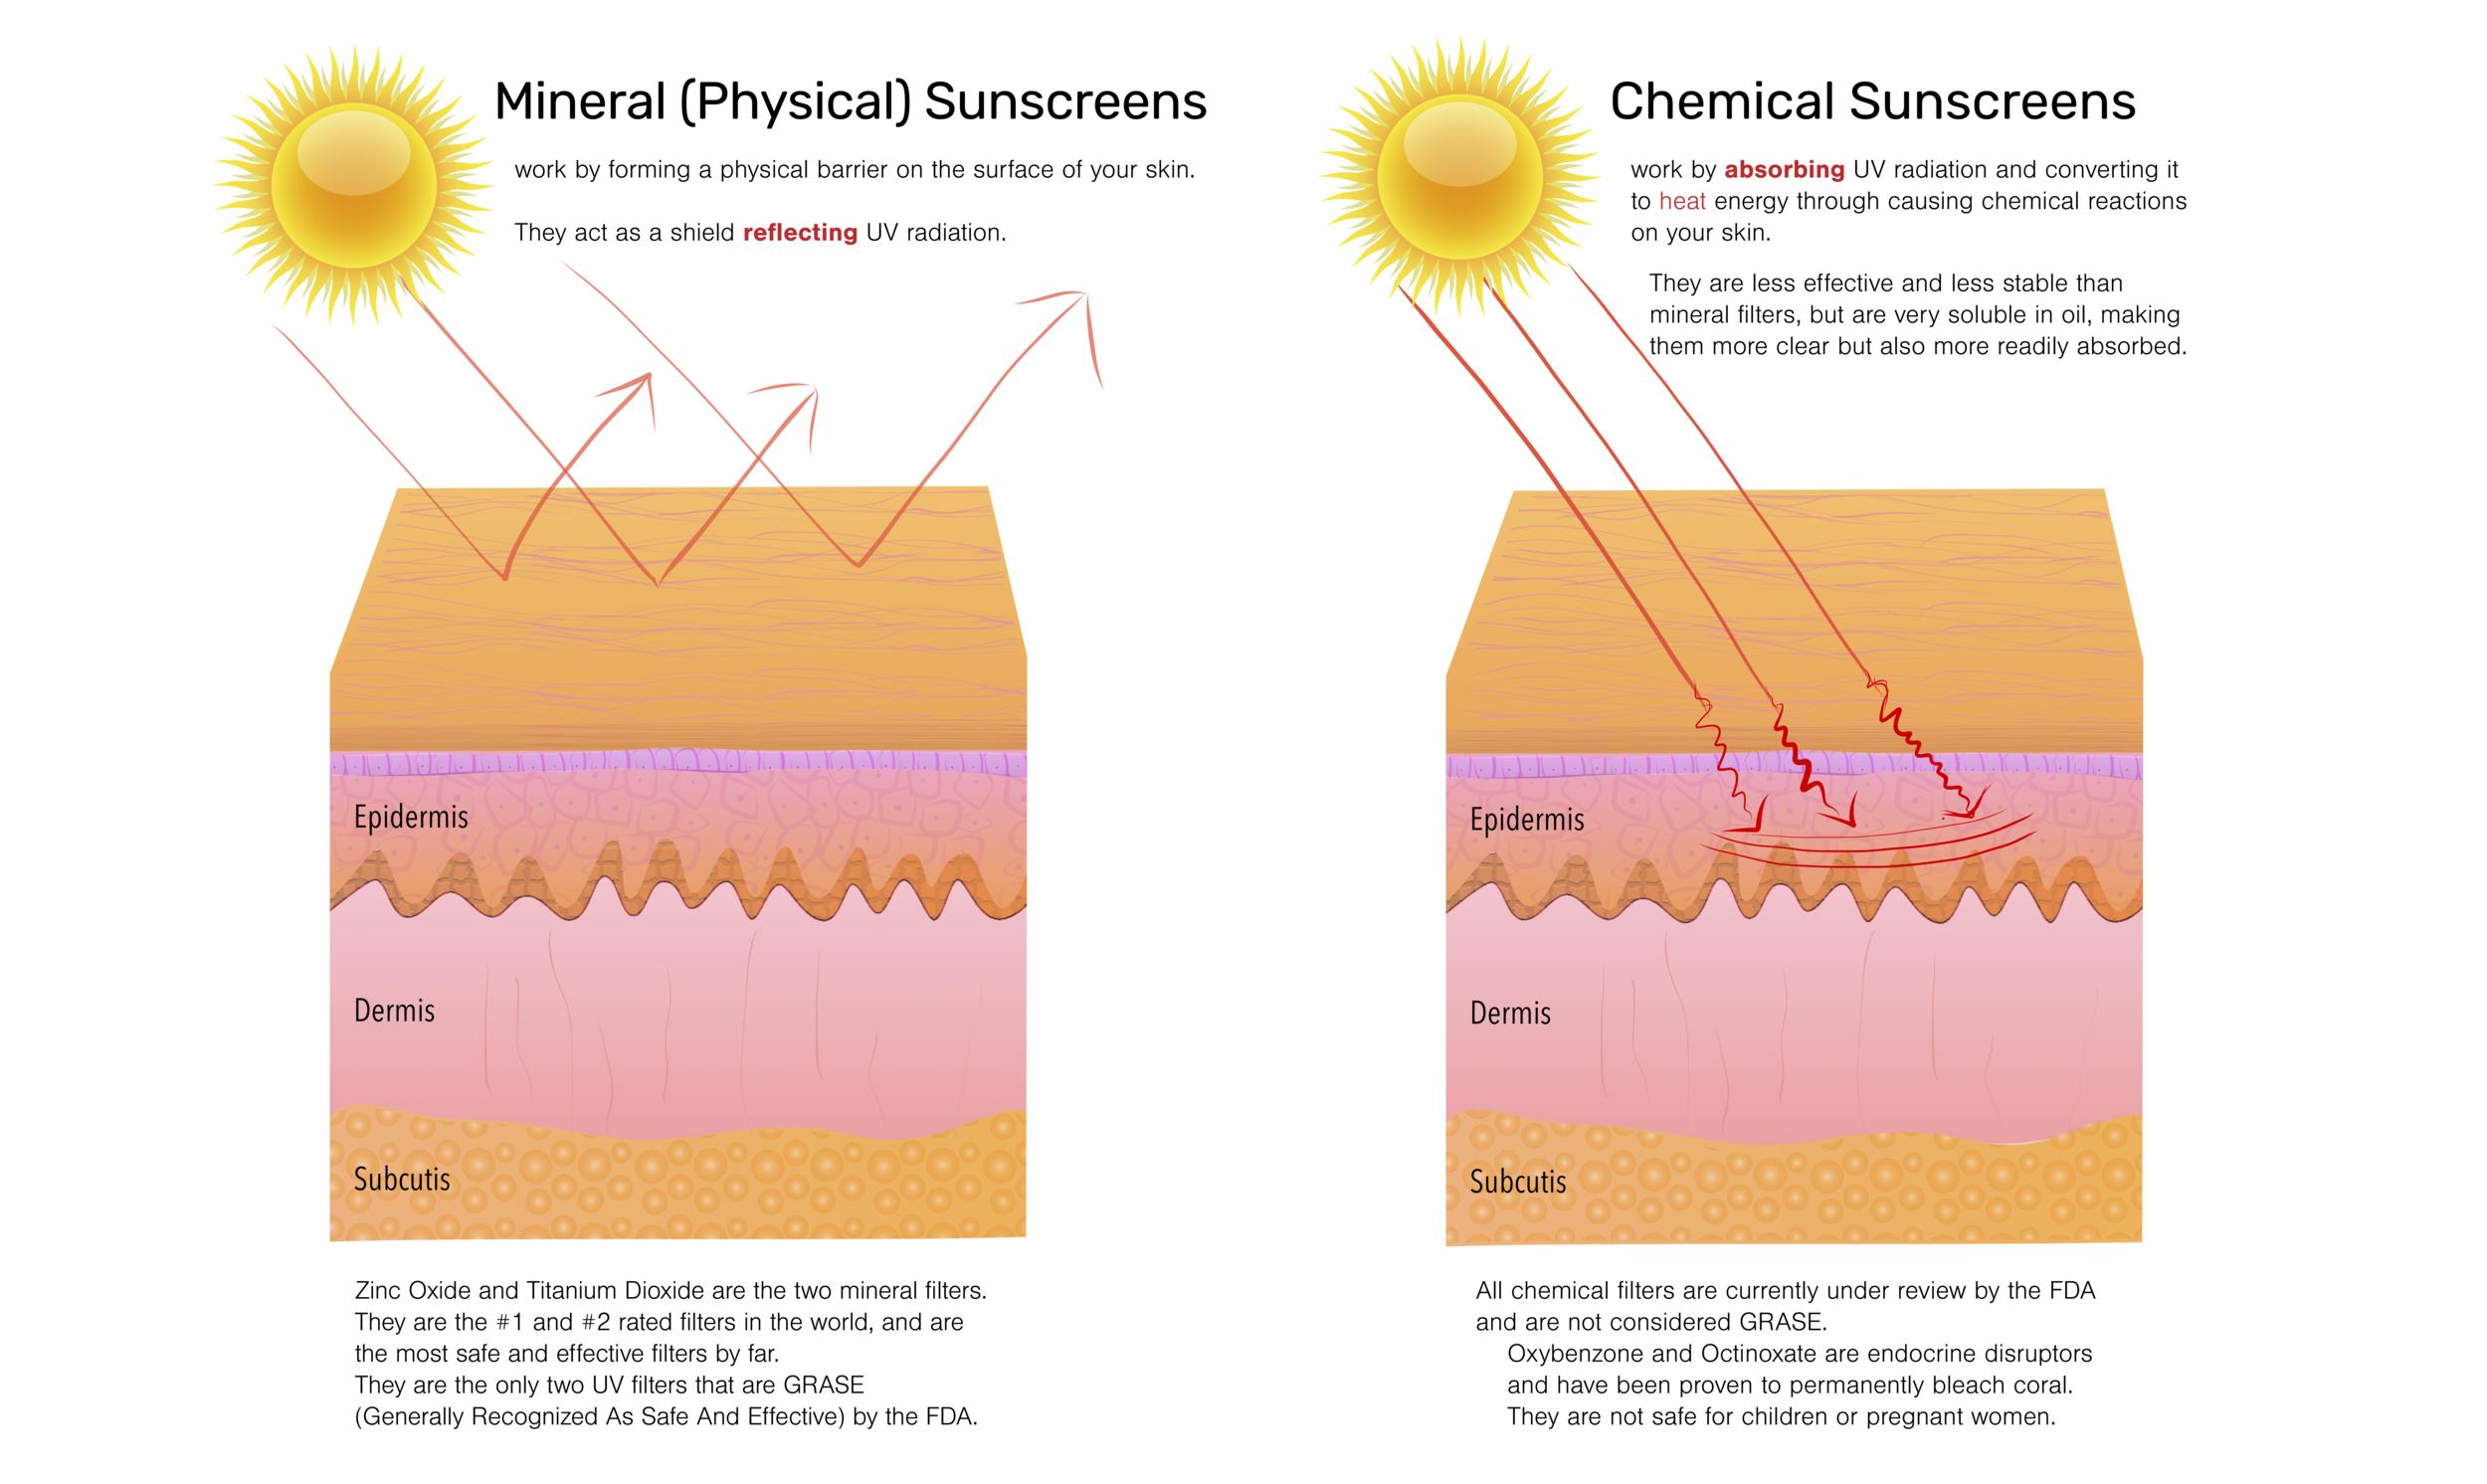 harken-derm-mineral-vs-chemical-sunscreens-diagram-explanation.png